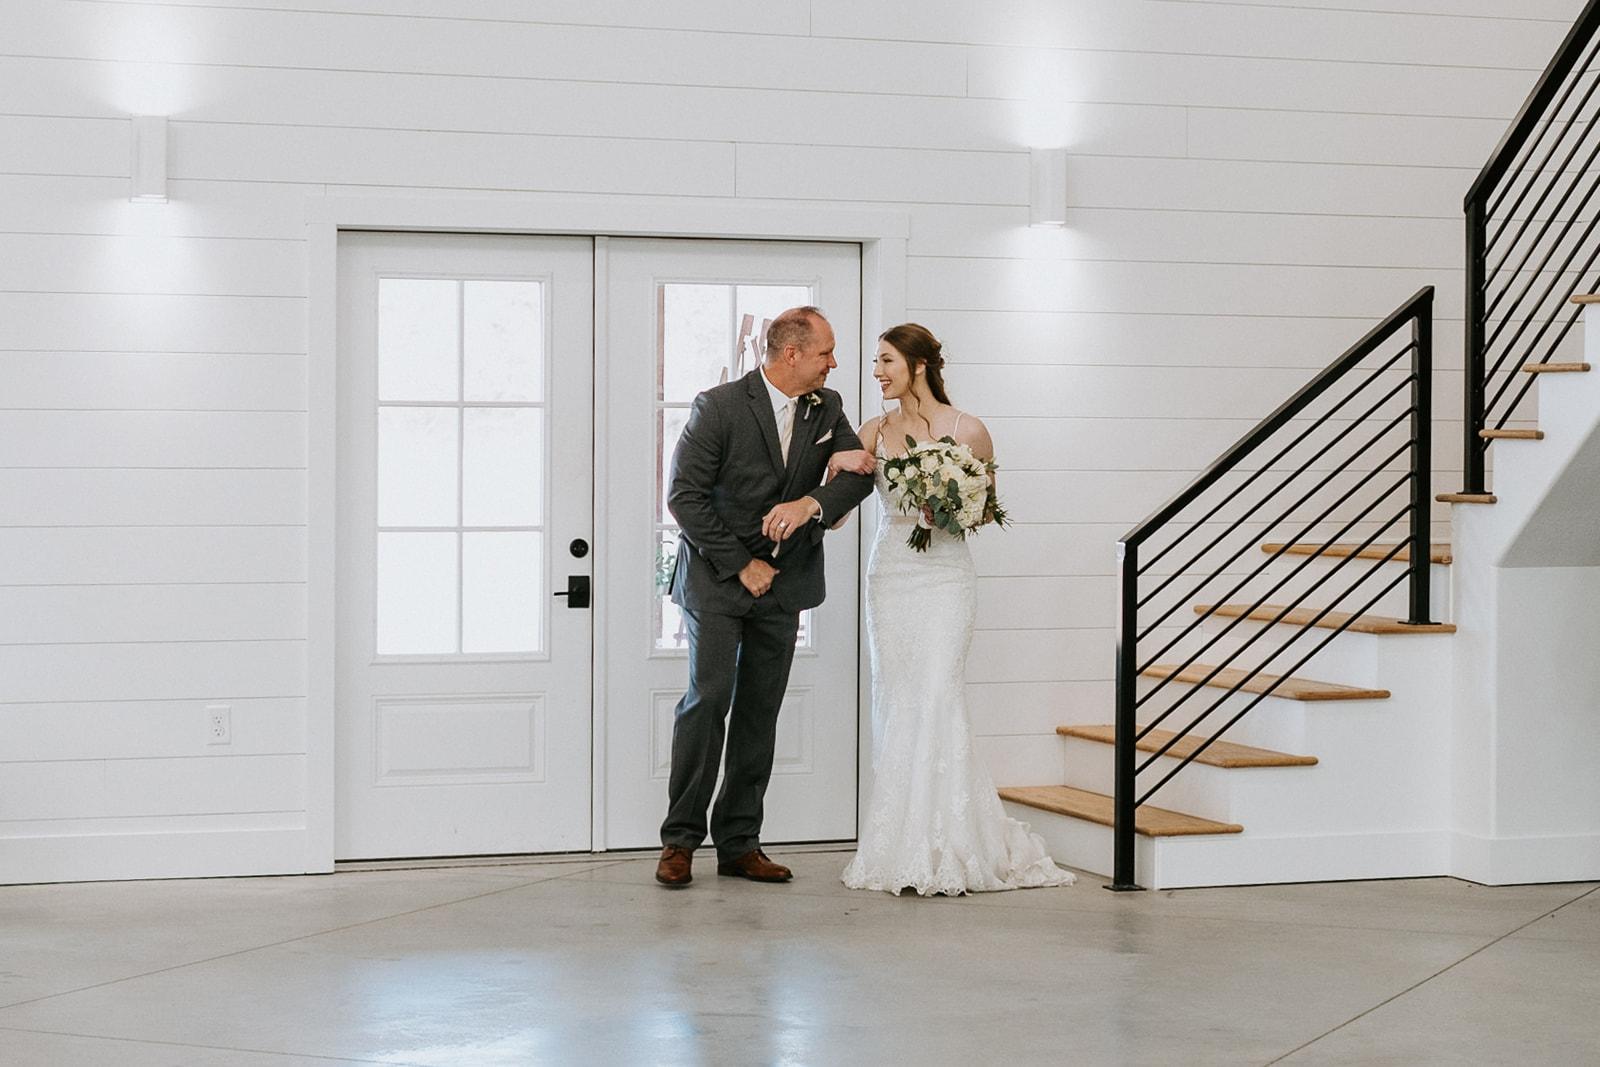 Sanburn-Wedding-Teasers-62.jpg